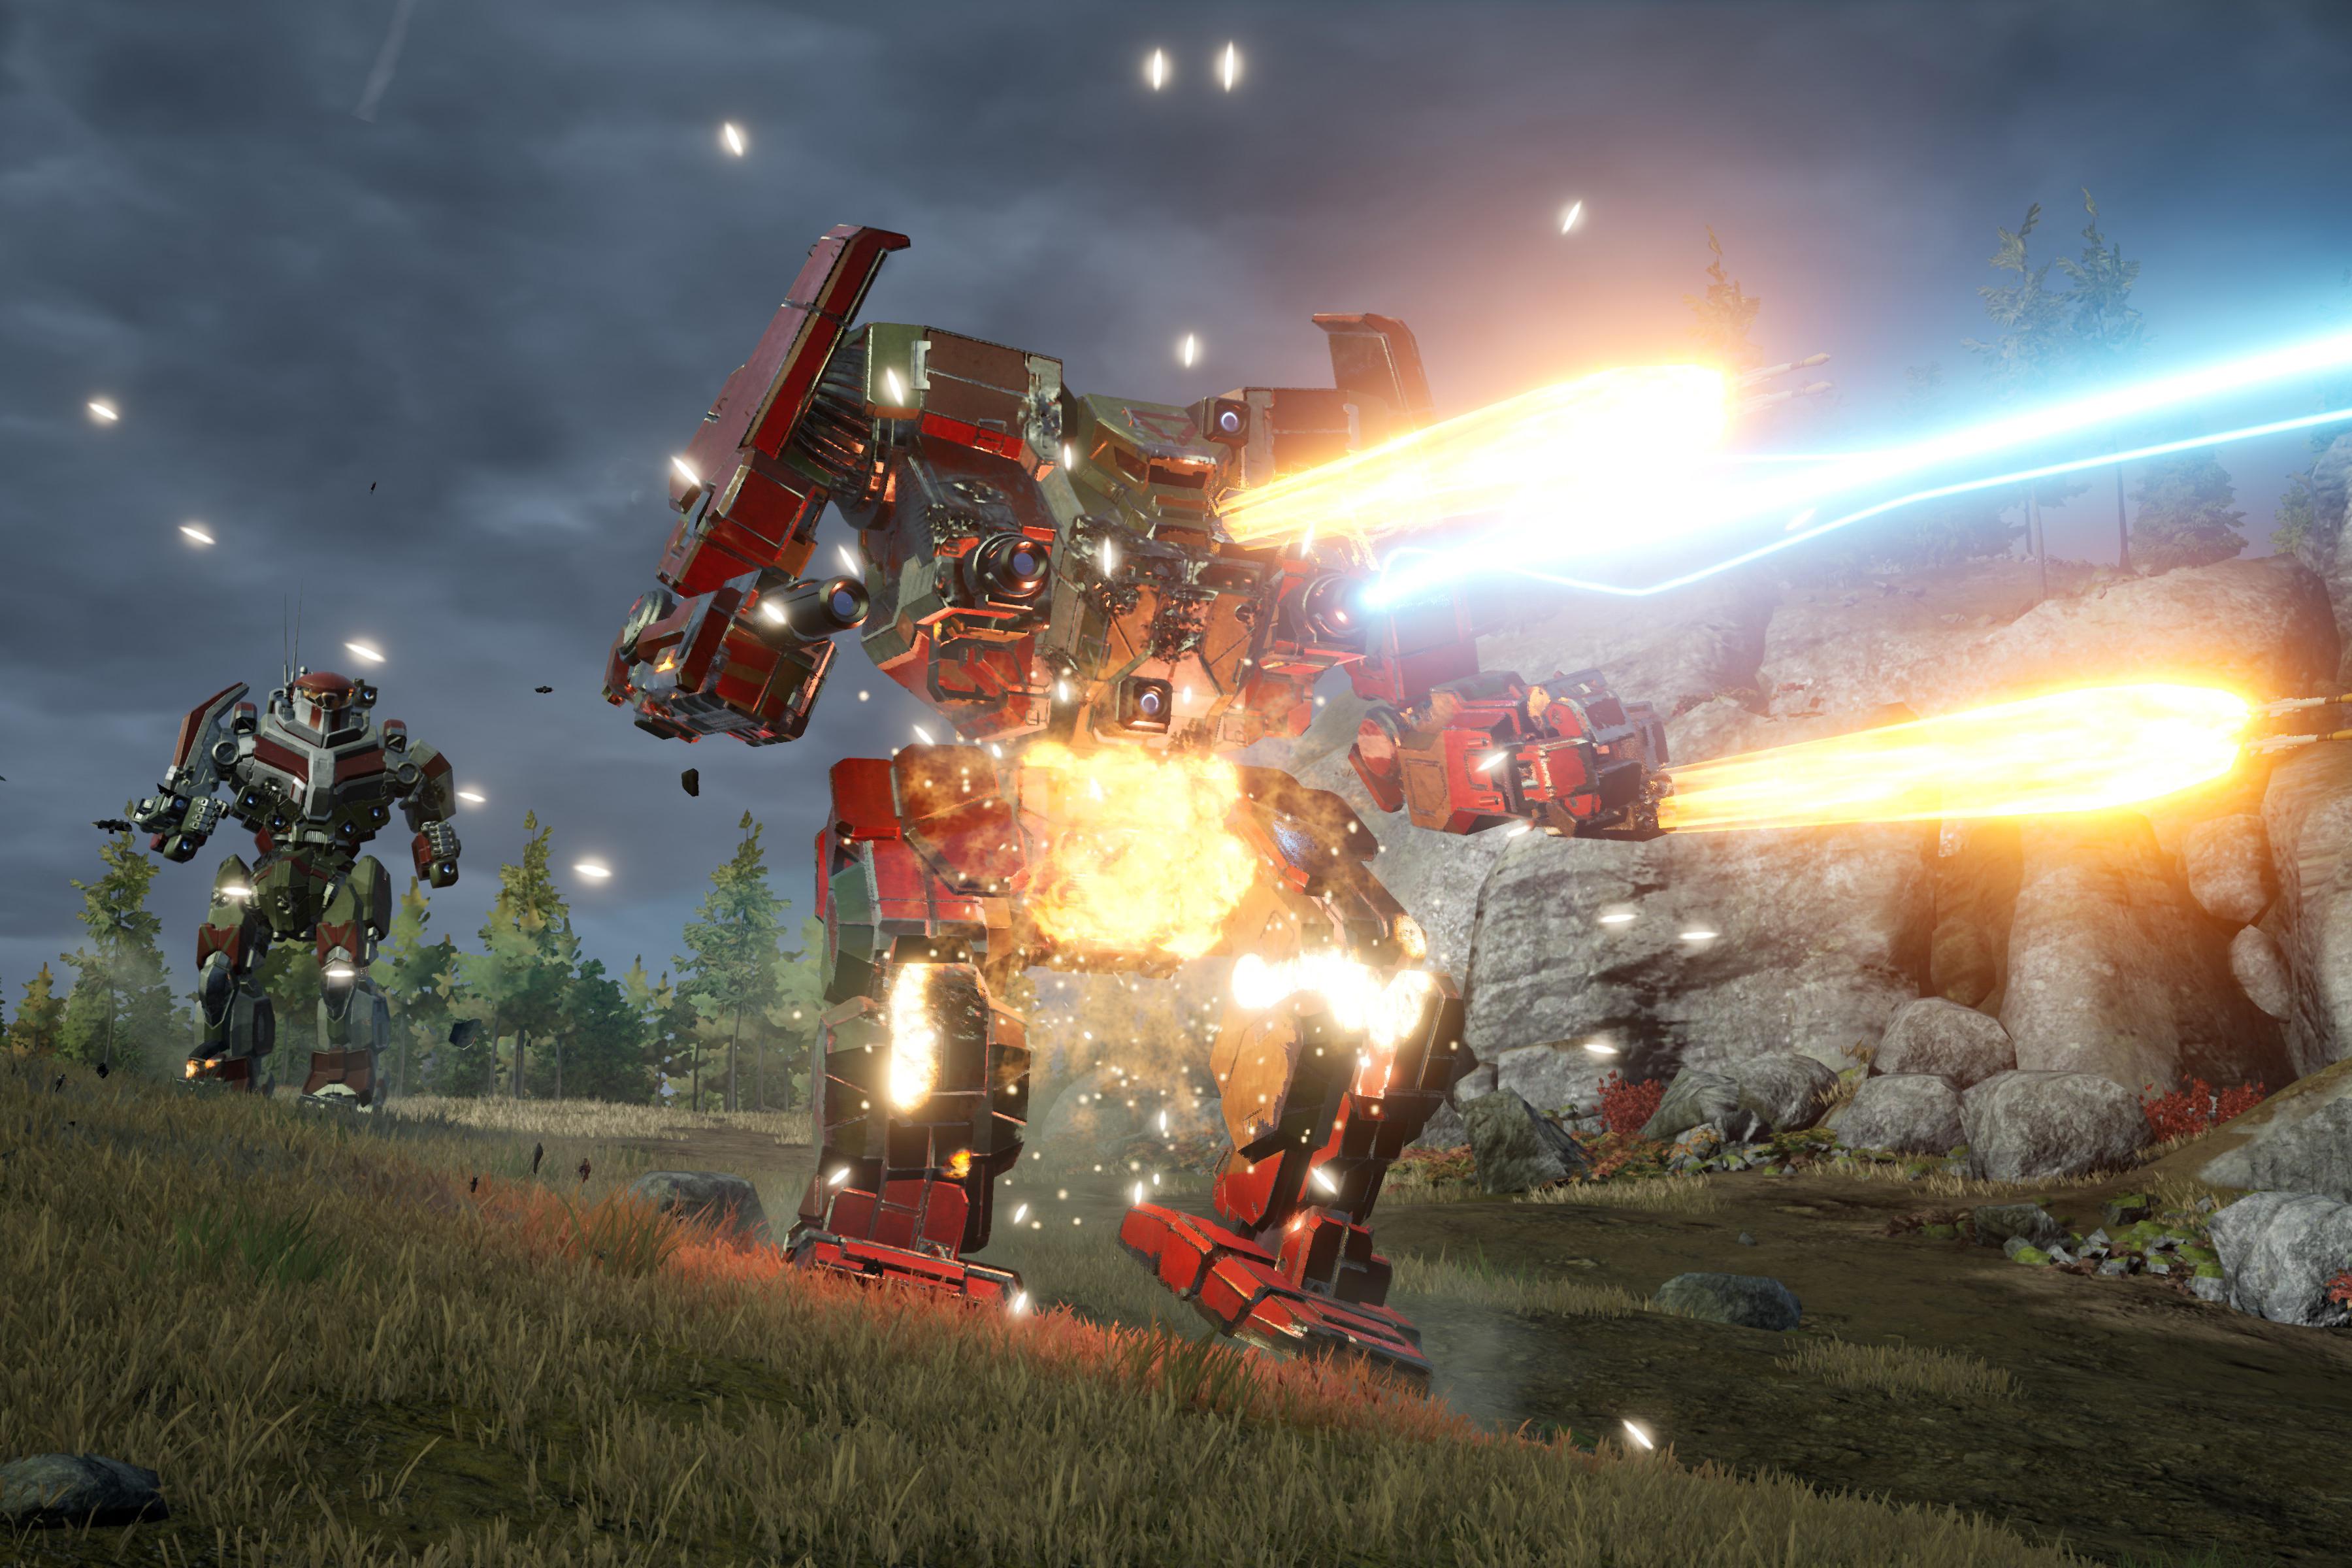 MechWarrior 5: Mercenaries is a broken game saved by a single button